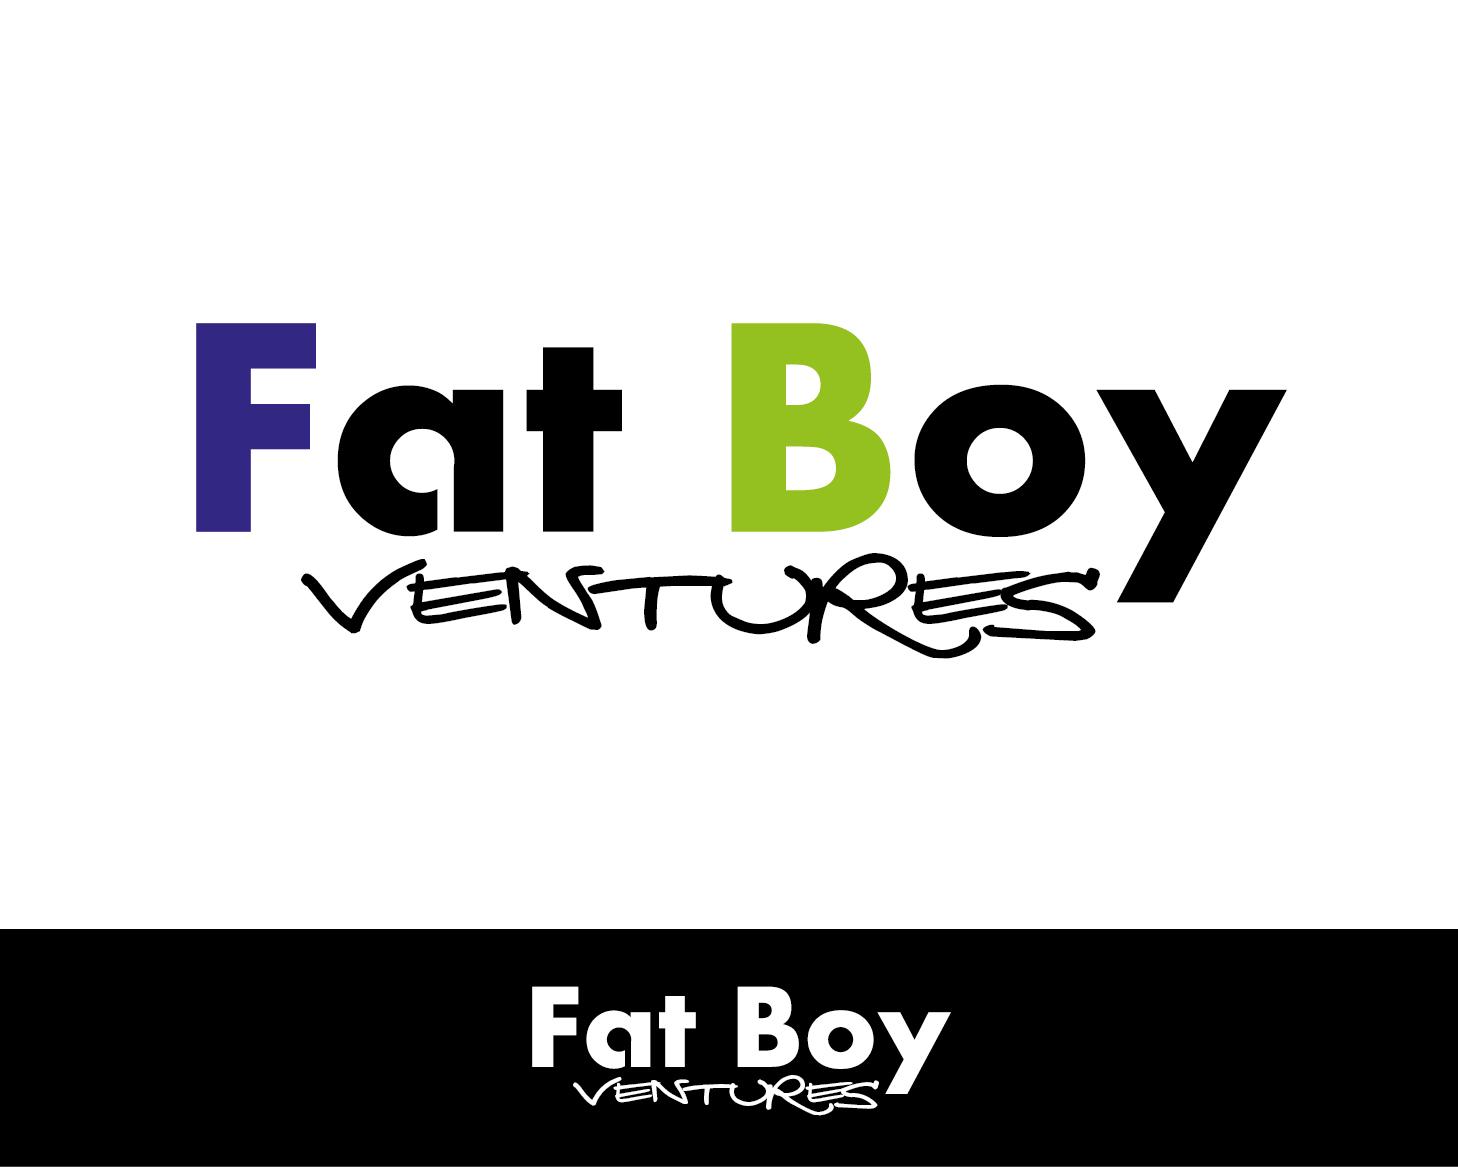 Logo Design by VENTSISLAV KOVACHEV - Entry No. 31 in the Logo Design Contest Fun Logo Design for Fat Boy Ventures.